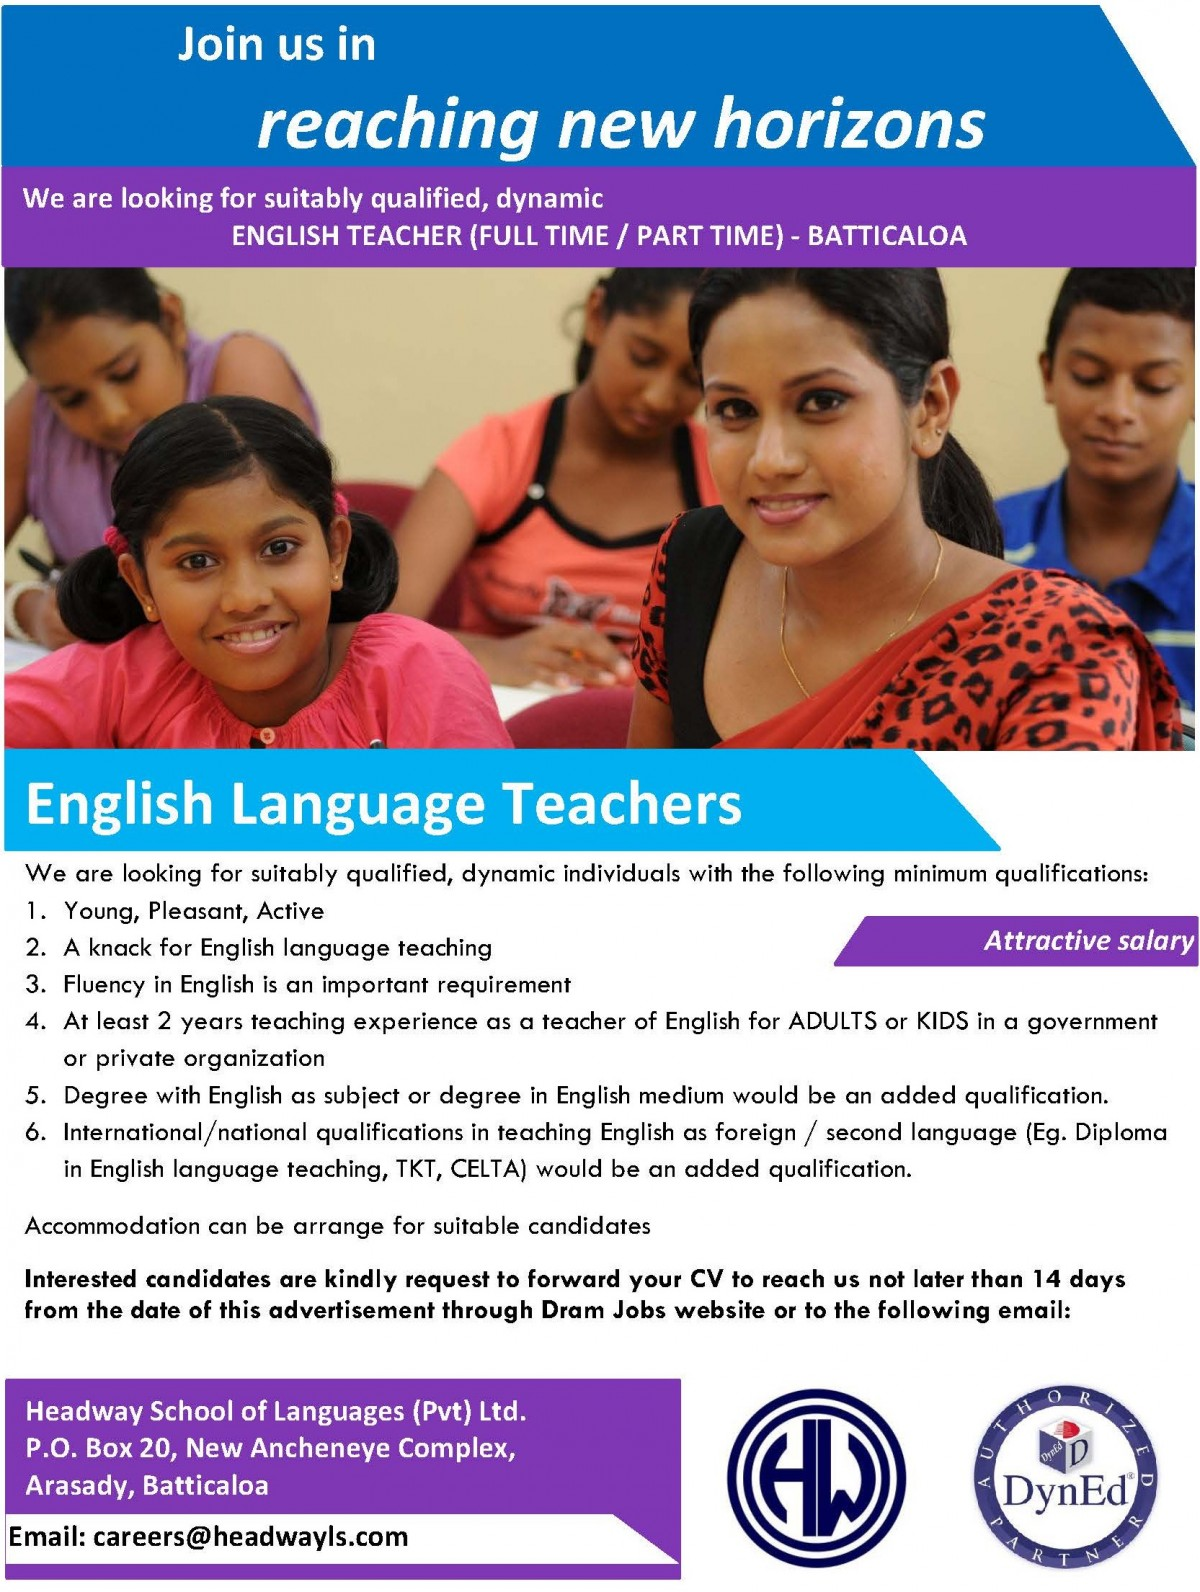 English Language Teachers 2019